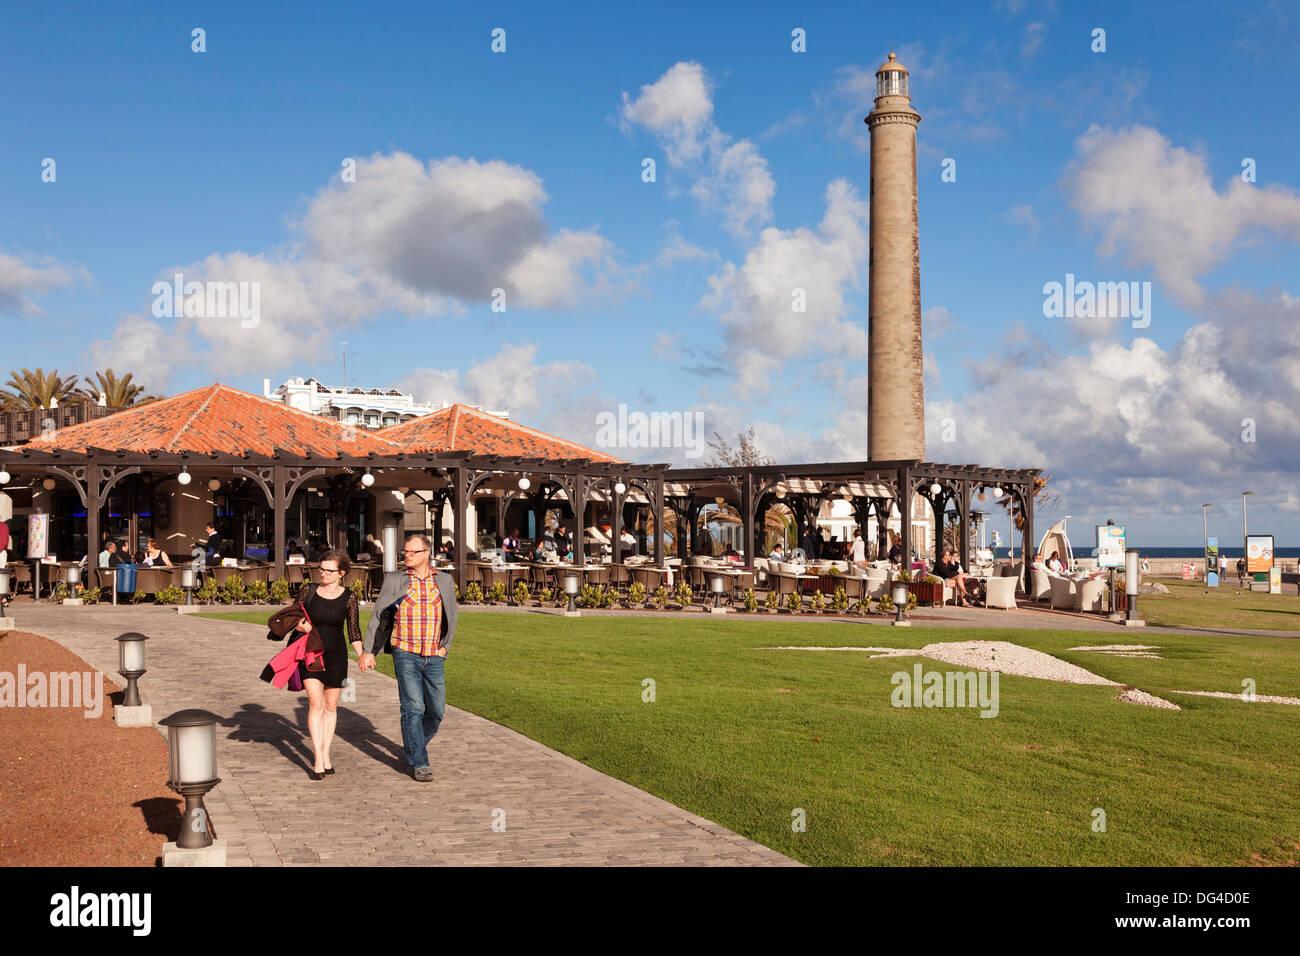 Promenade und der Leuchtturm Faro de Maspalomas, Maspalomas, Gran Canaria, Kanarische Inseln, Spanien, Europa Stockbild